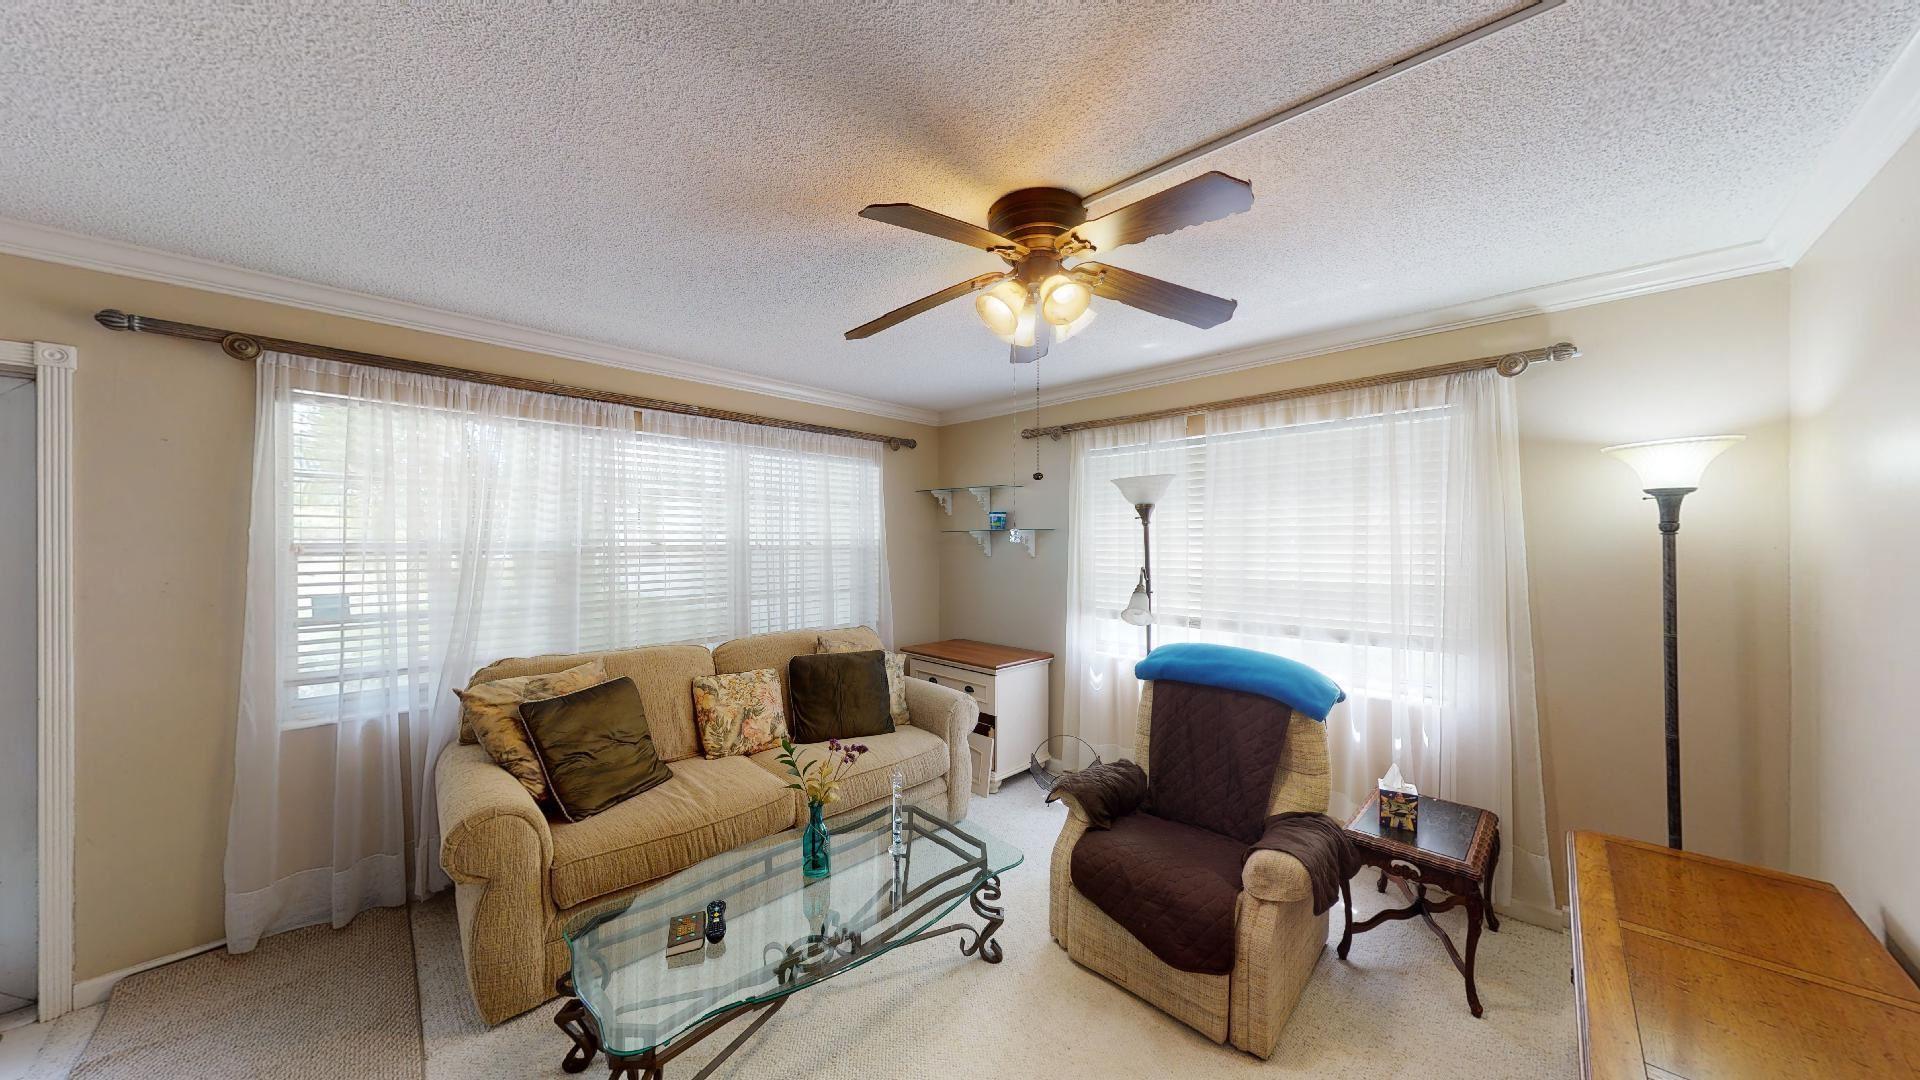 52 Dorchester C, West Palm Beach, FL 33417 - MLS#: RX-10722635